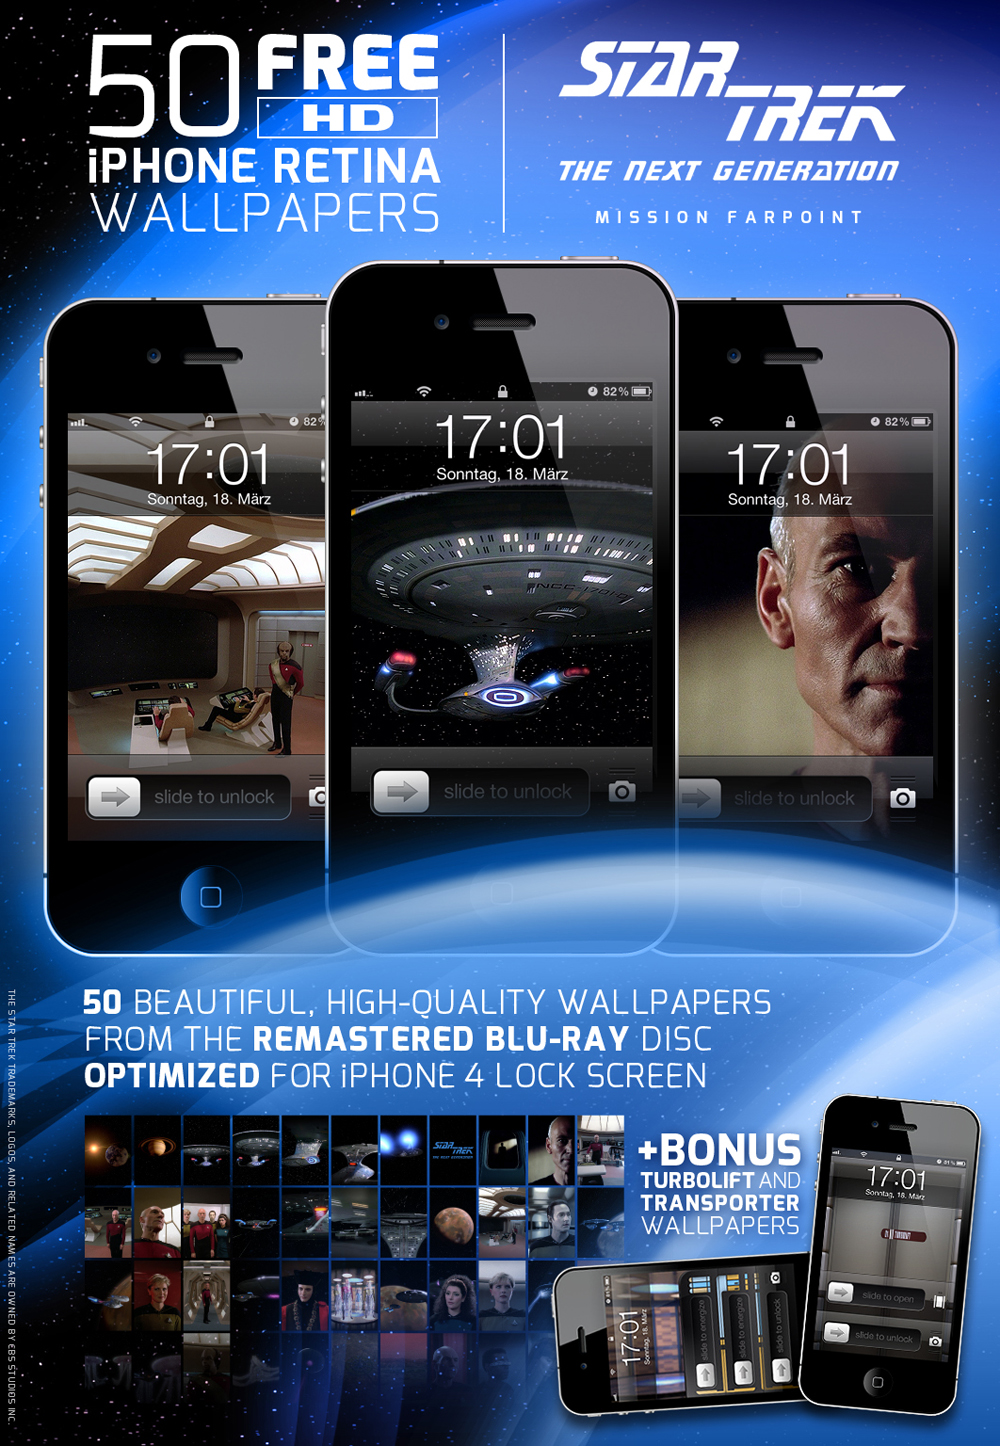 Star Trek TNG: Mission Farpoint iPhone Wallpapers